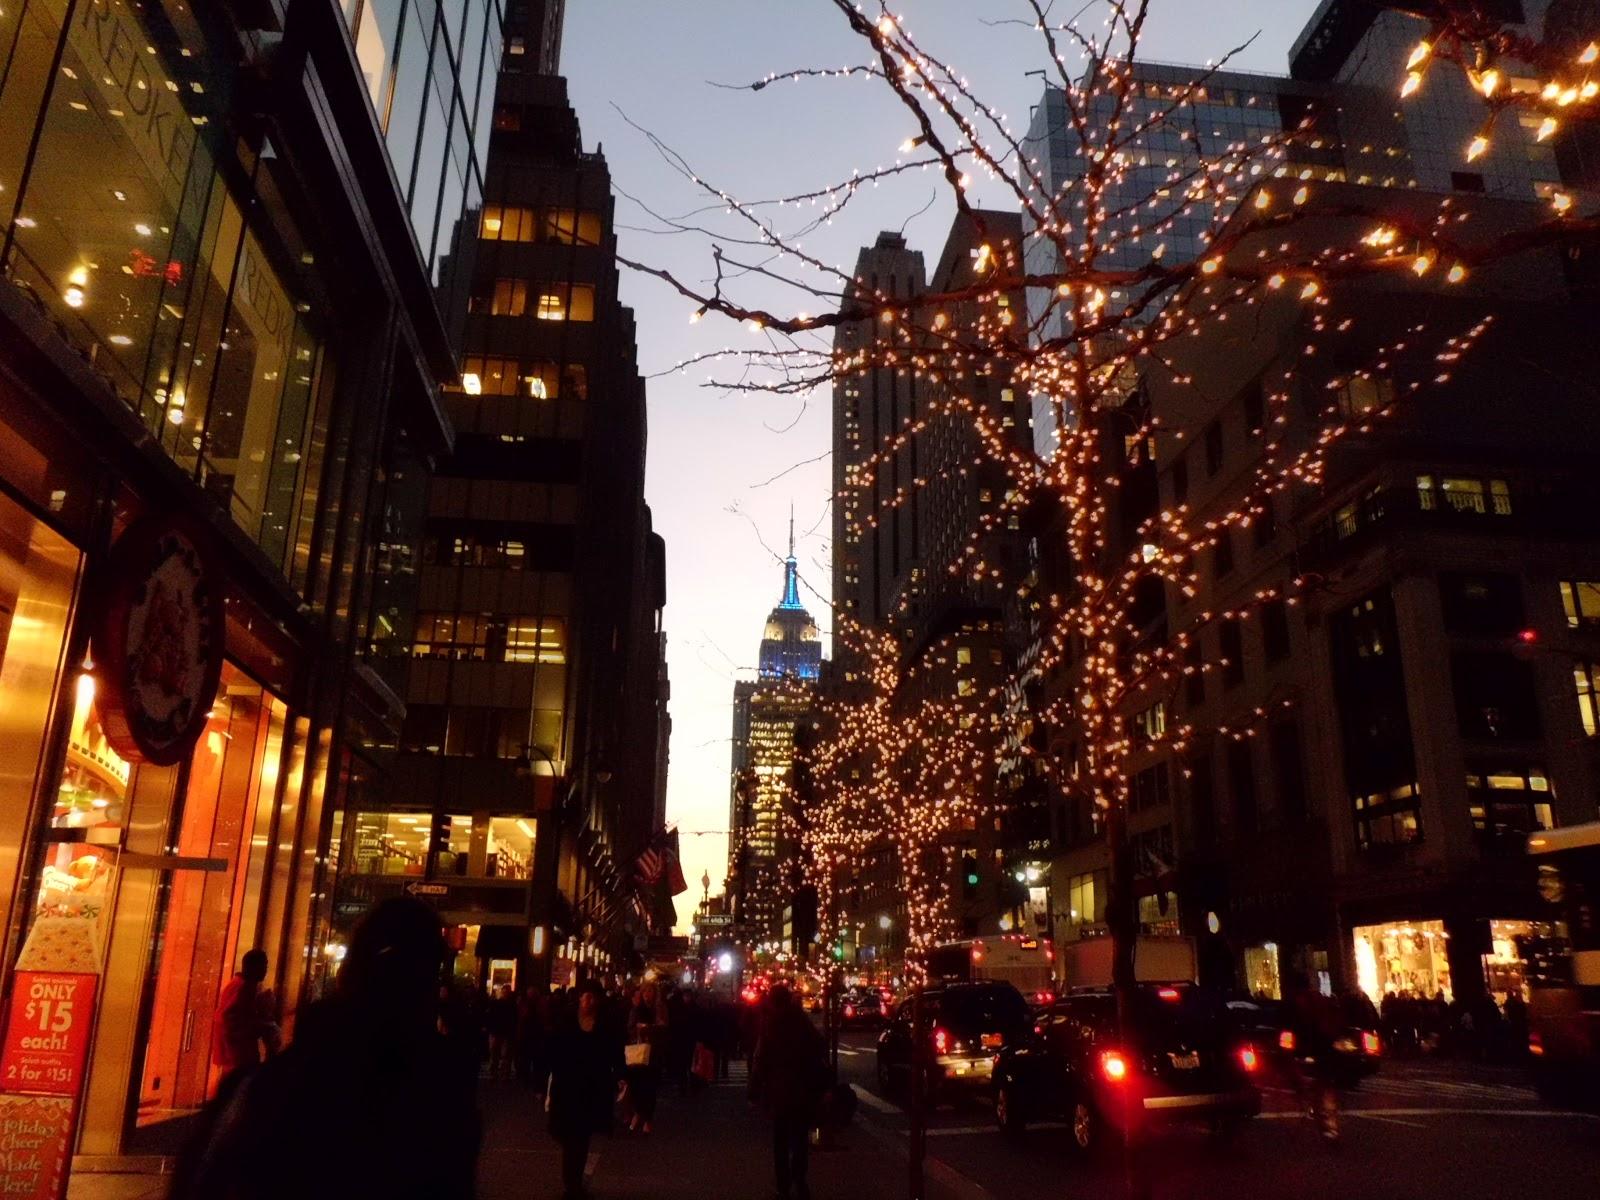 New York City Christmas 4 Wallpaper   Hivewallpapercom 1600x1200